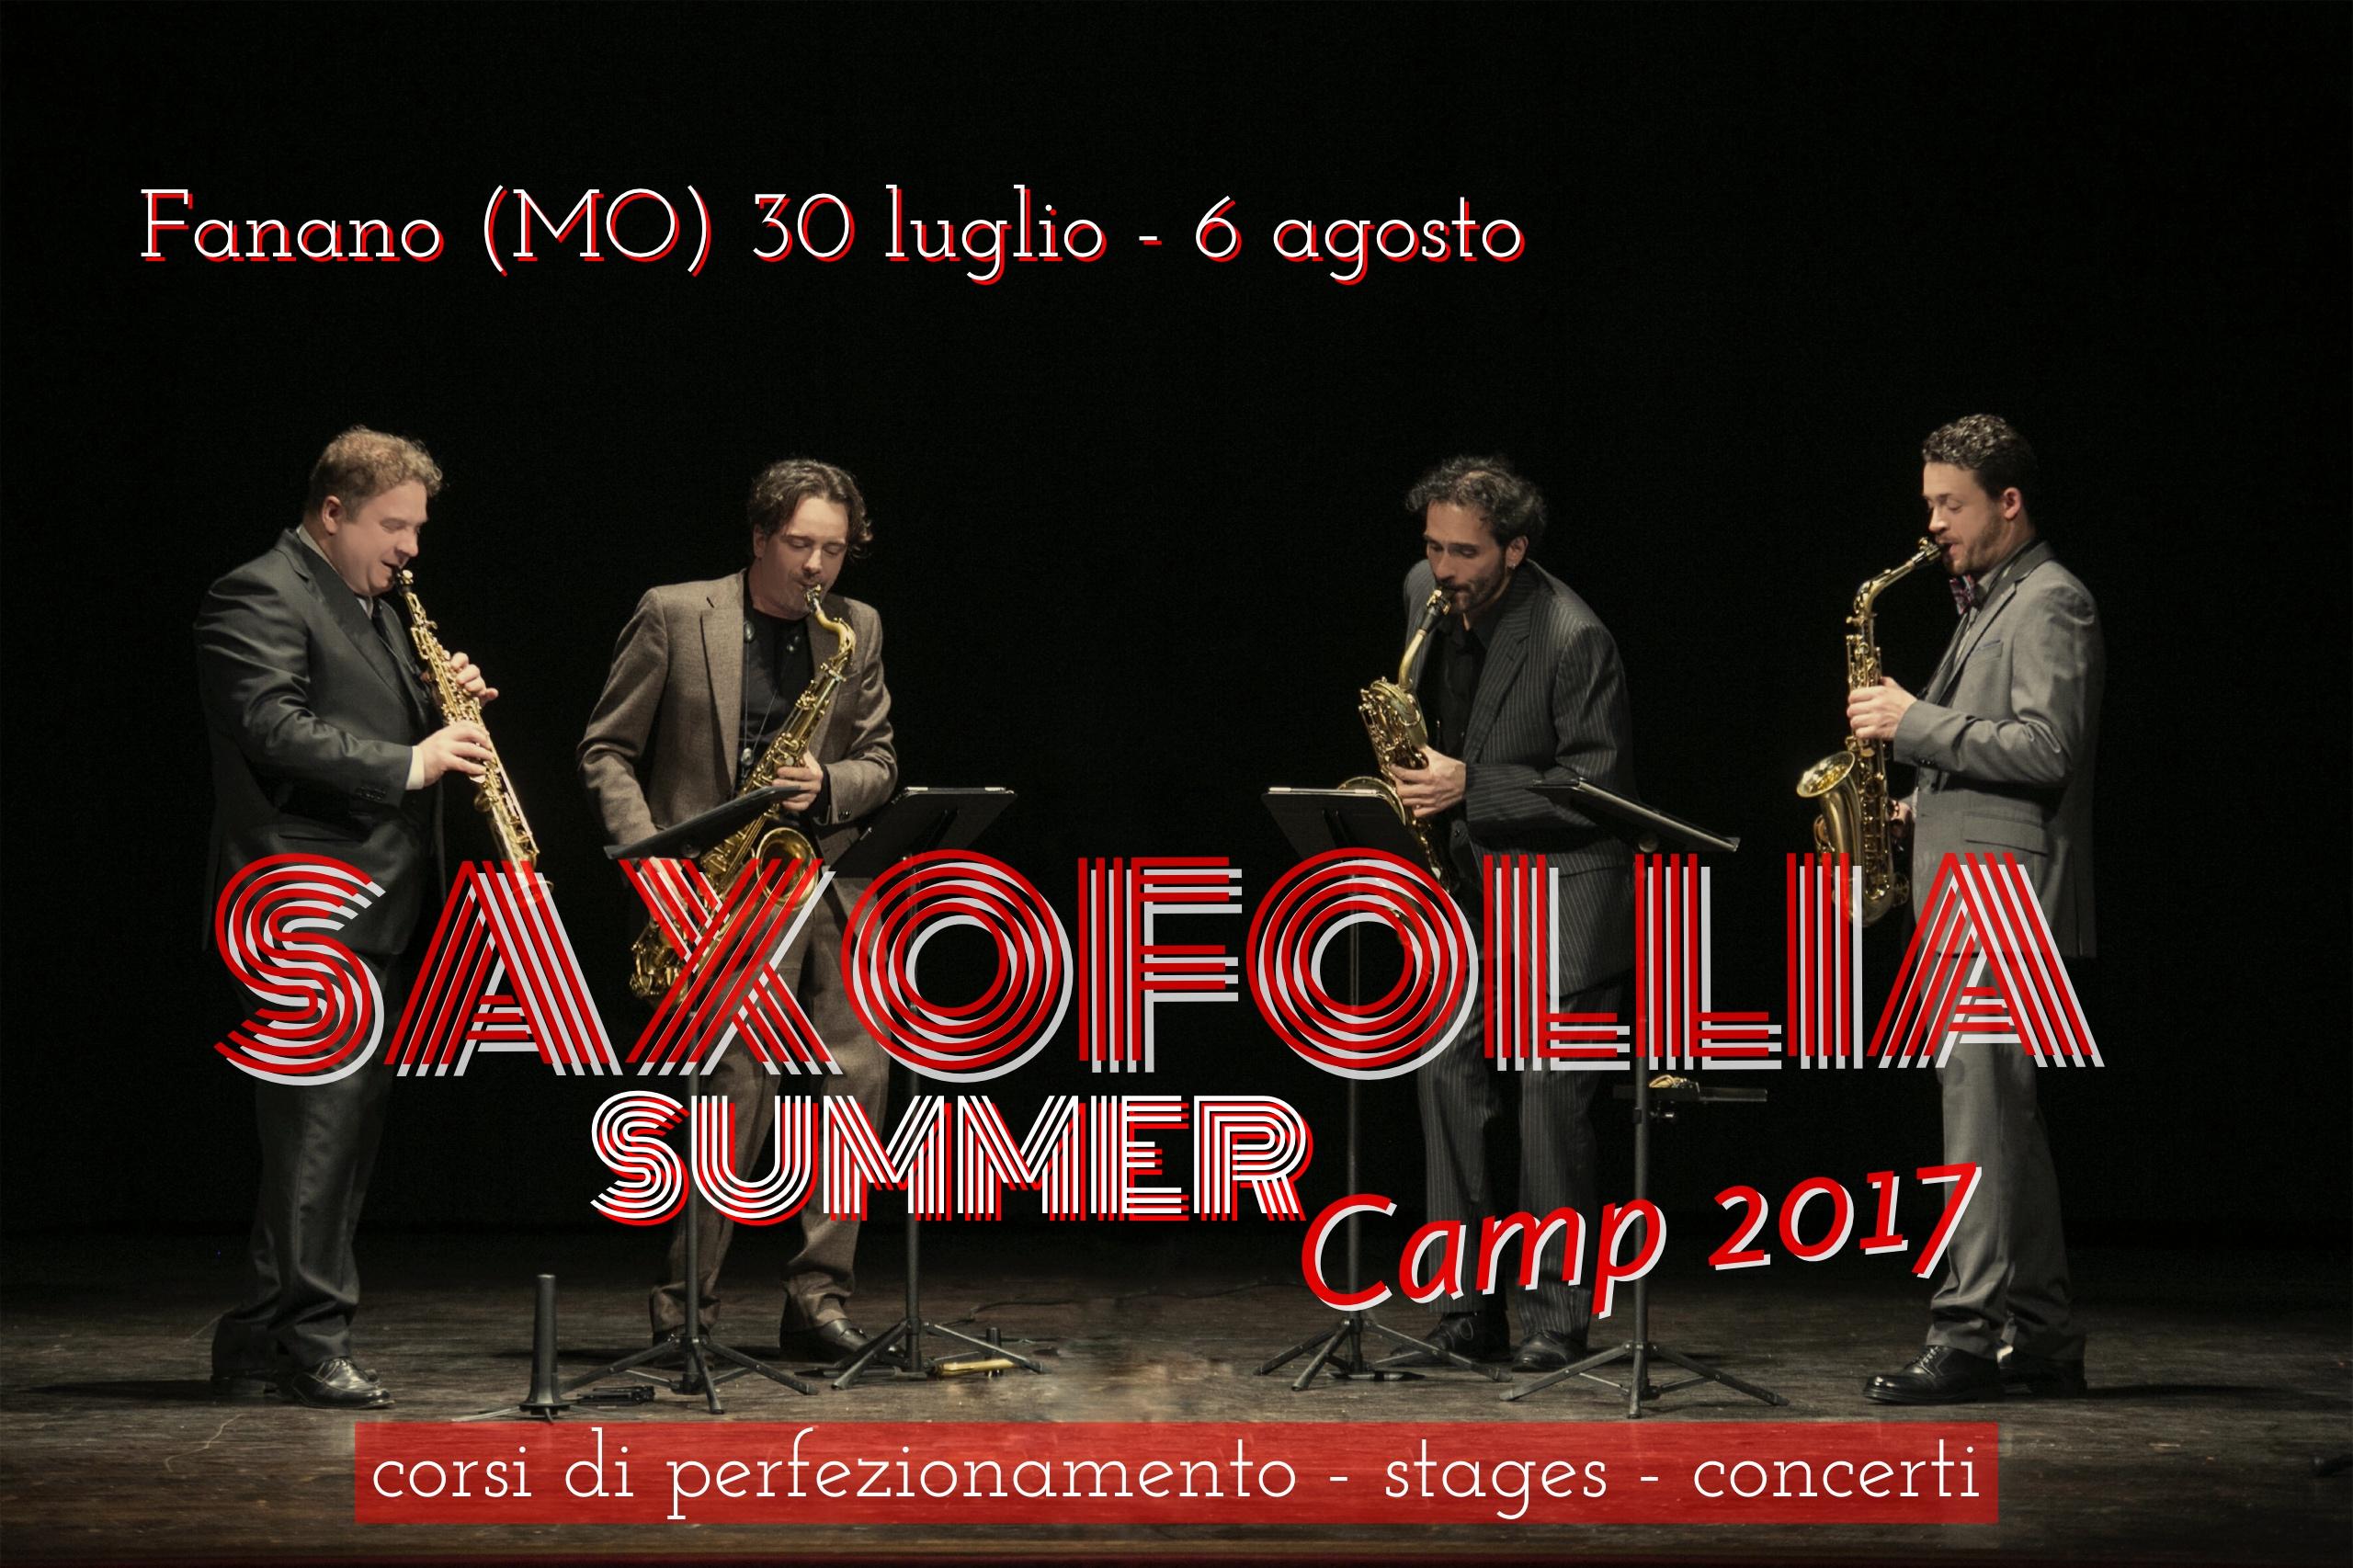 Saxofollia Summer Camp 2017